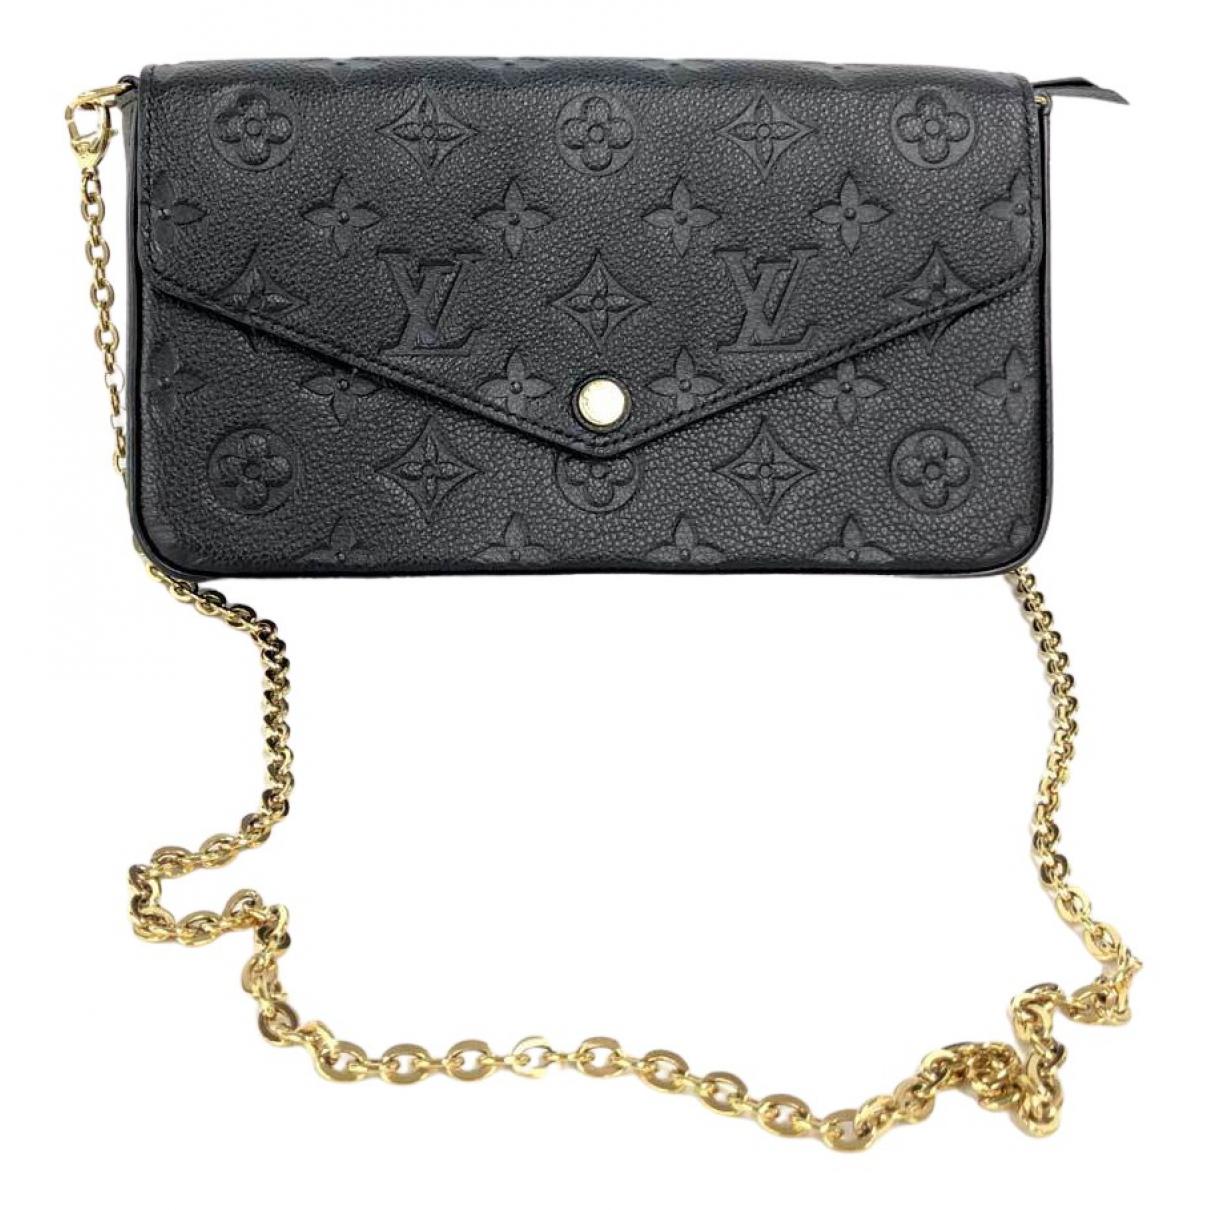 Pochette Felicie de Cuero Louis Vuitton